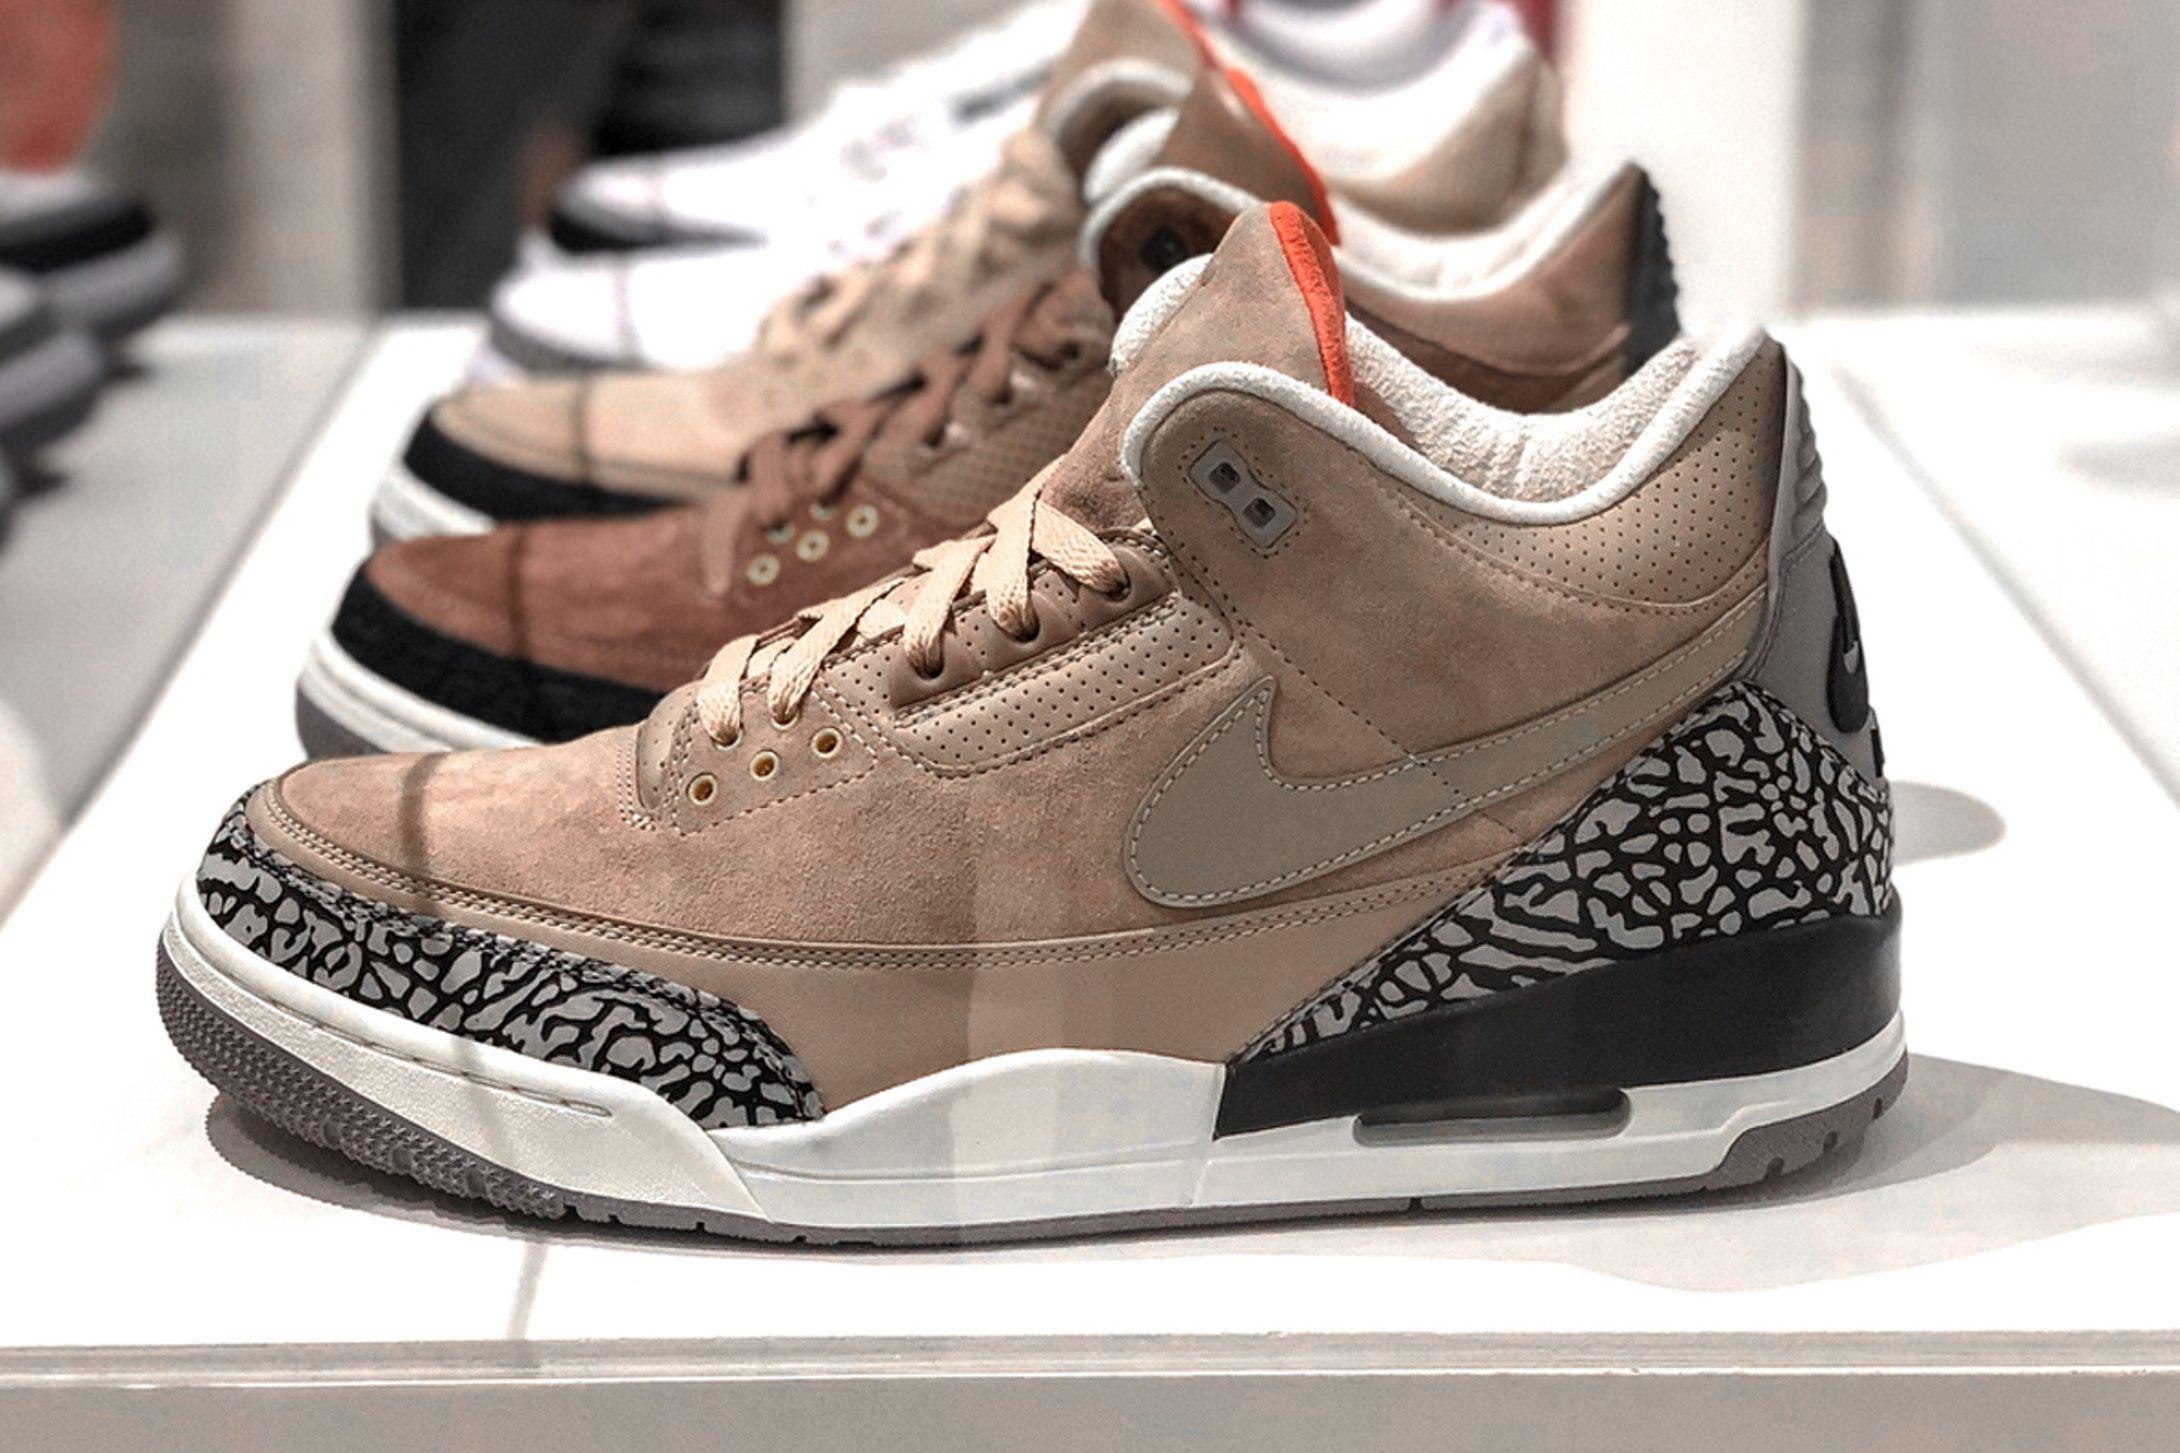 Men's Nike Jordan Reveal Premium Wolf Grey Vachetta Ta Sneakers : K46x3479